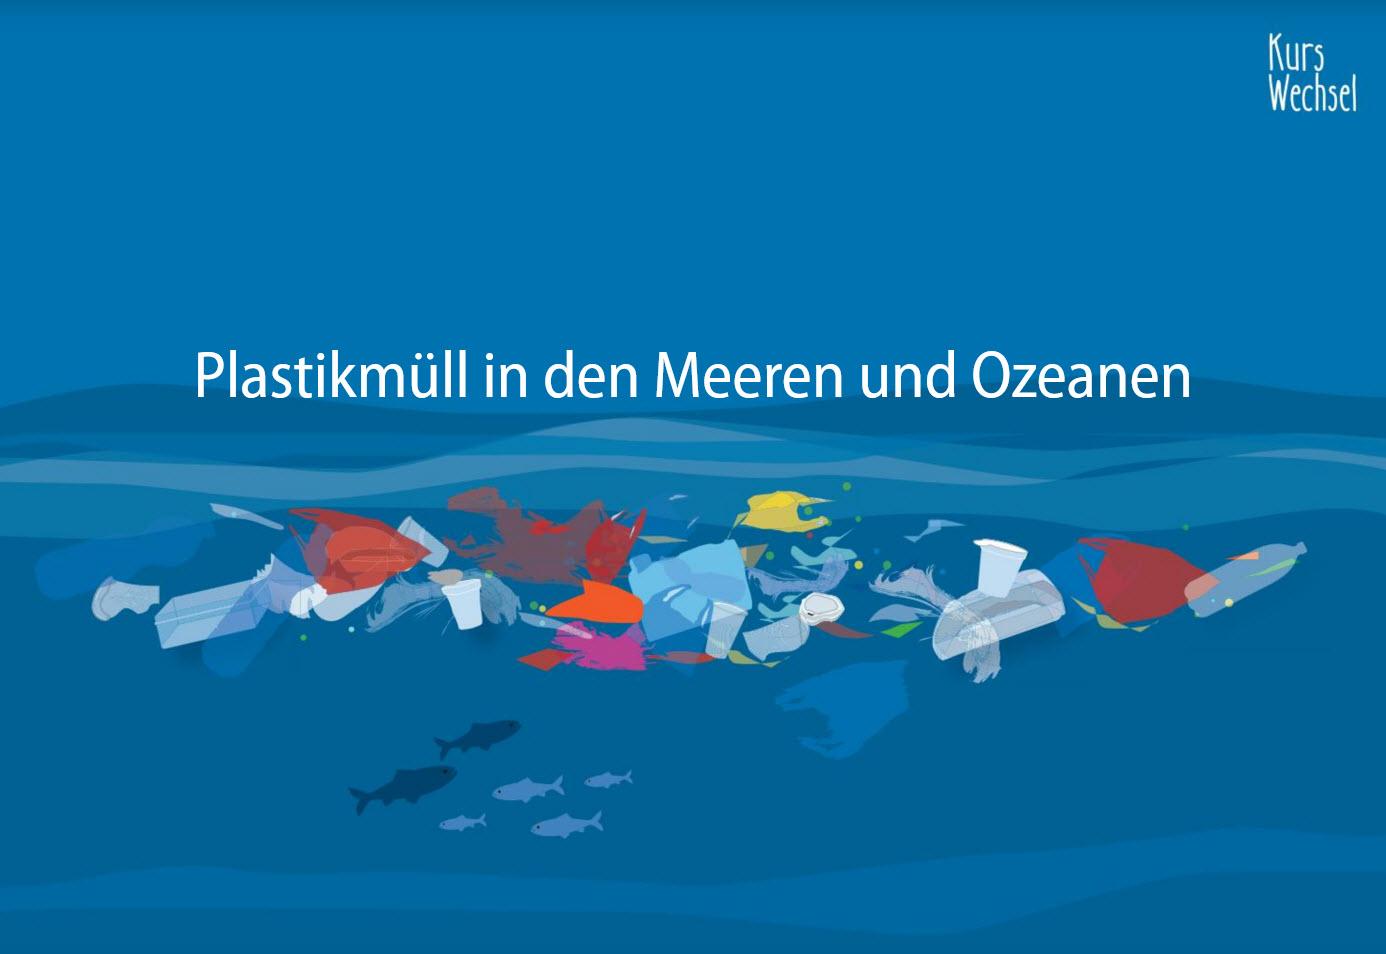 Titelbild des Kartensets. Quelle: kurswechsel.bildungscent.de